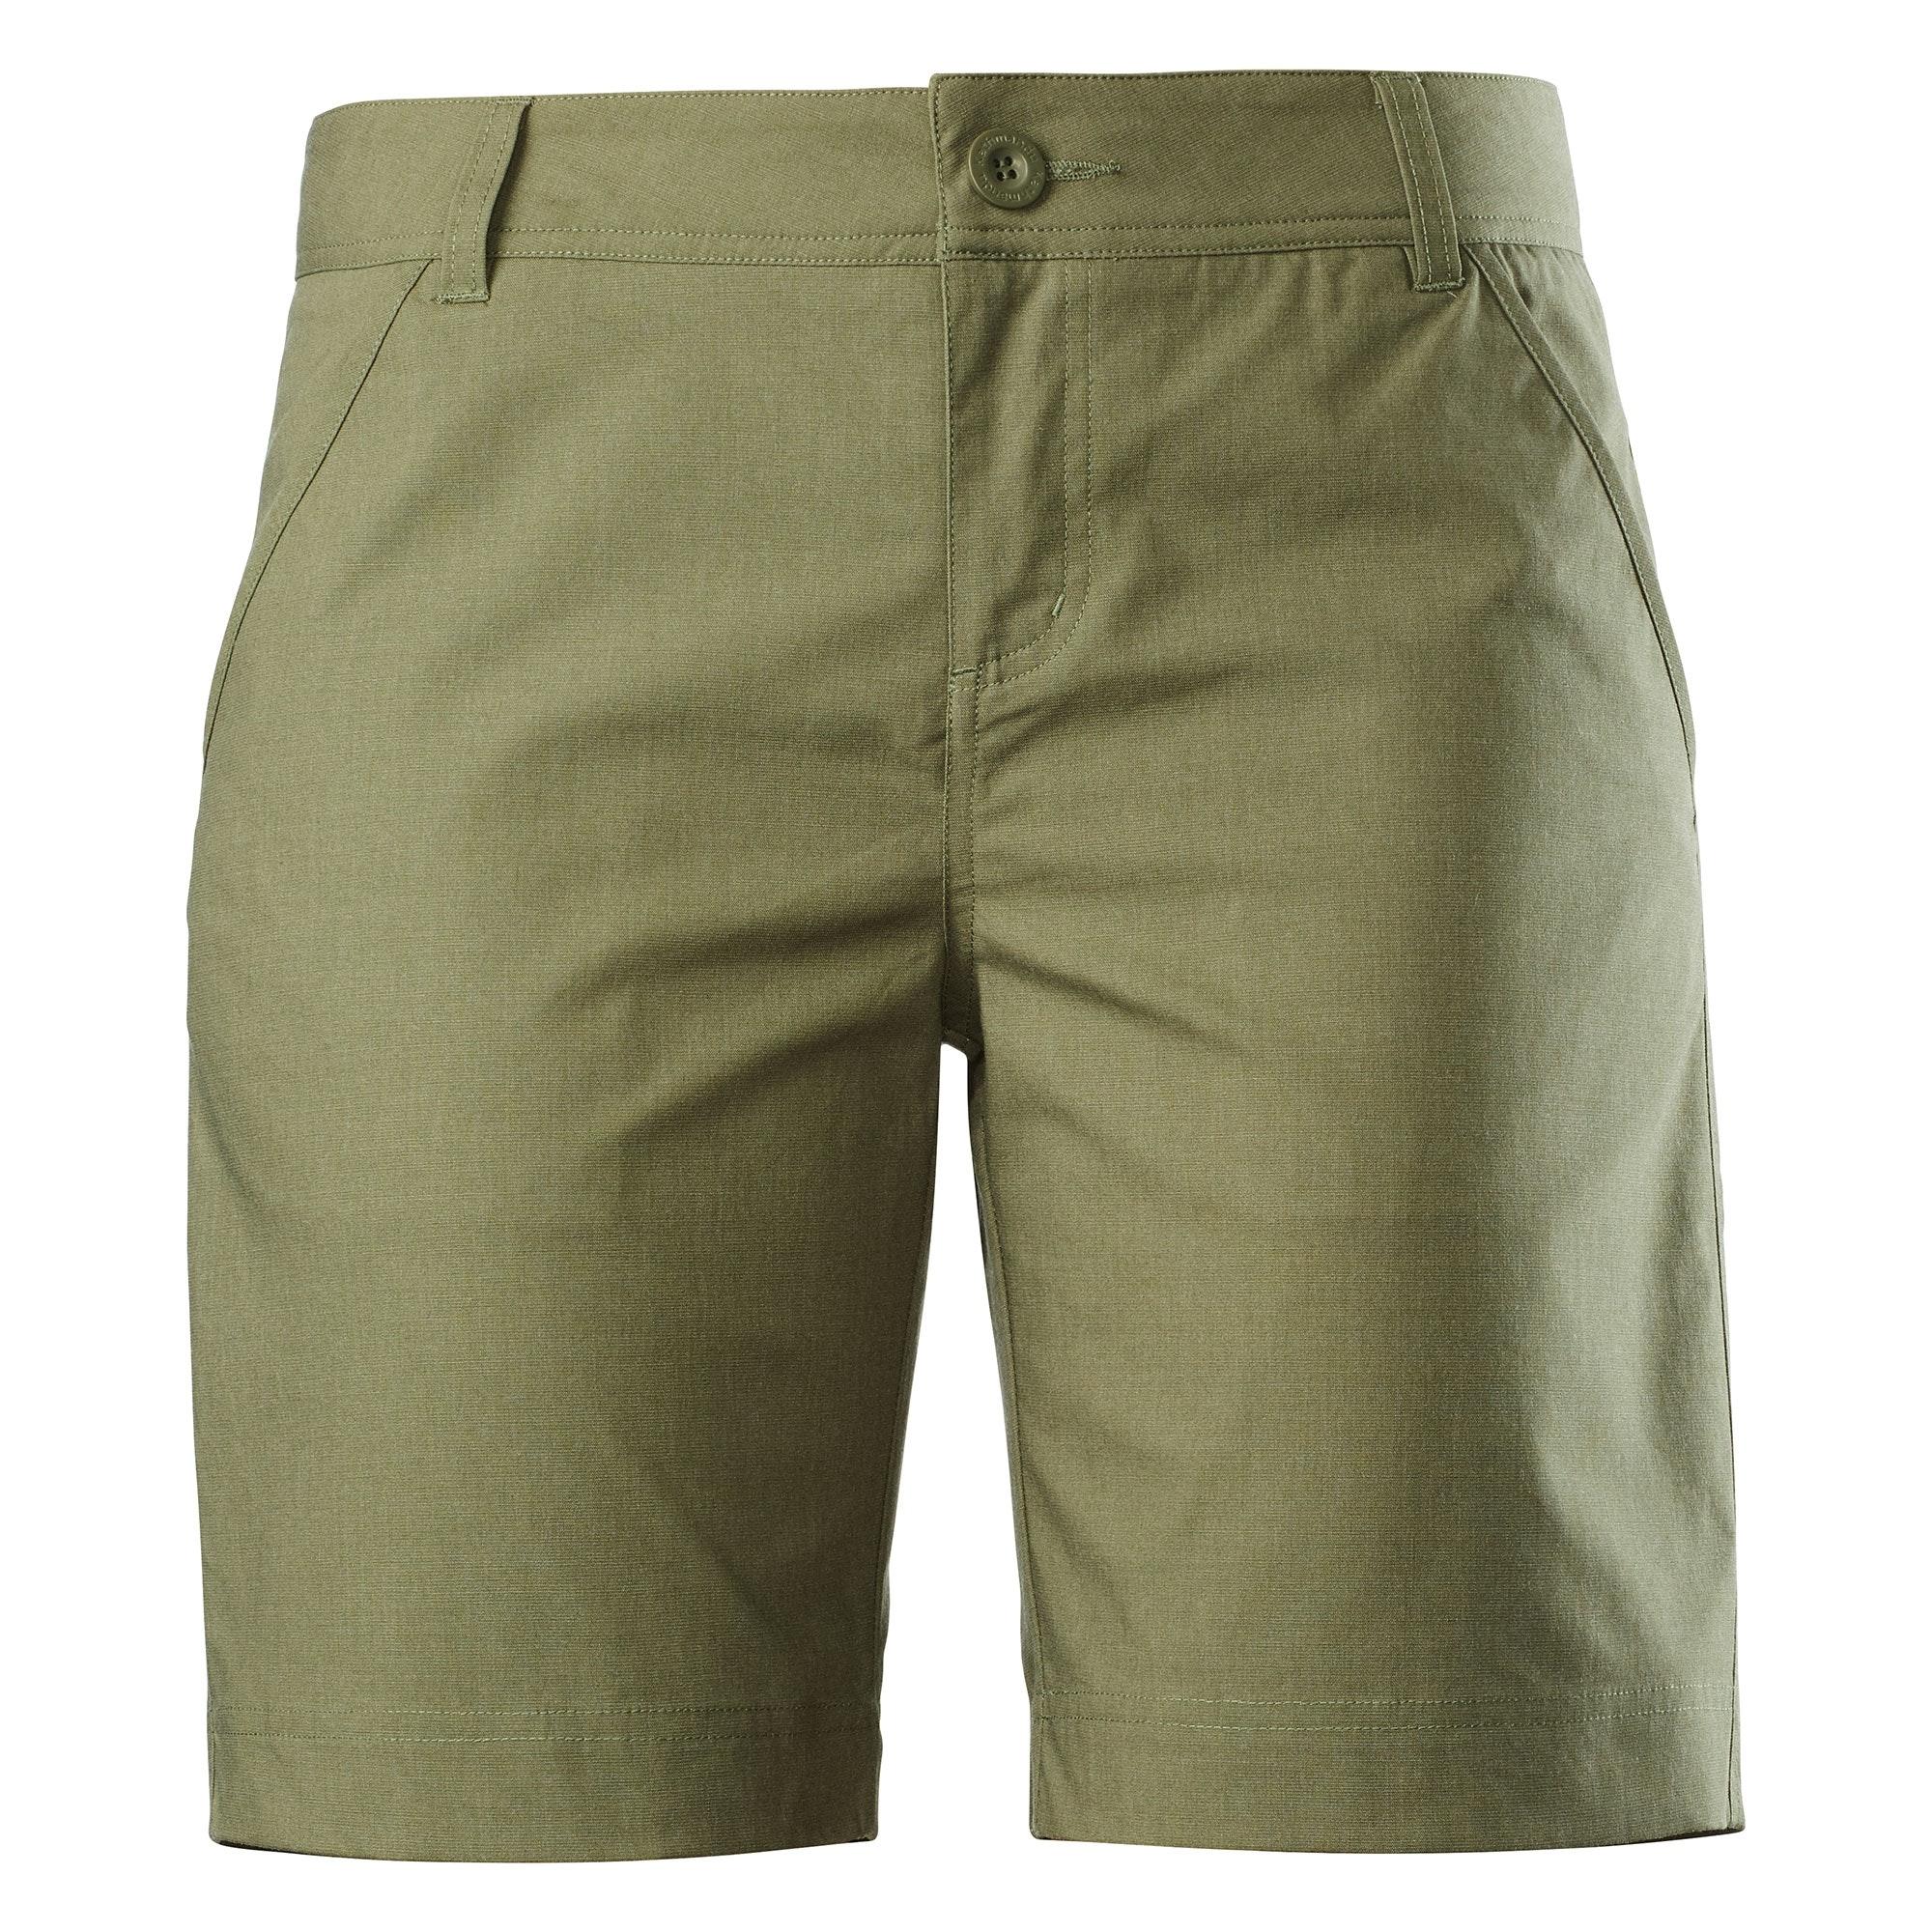 074bb800953 Details about NEW Kathmandu Flaxton Womens Mid Length Lightweight Stylish  Casual Travel Shorts